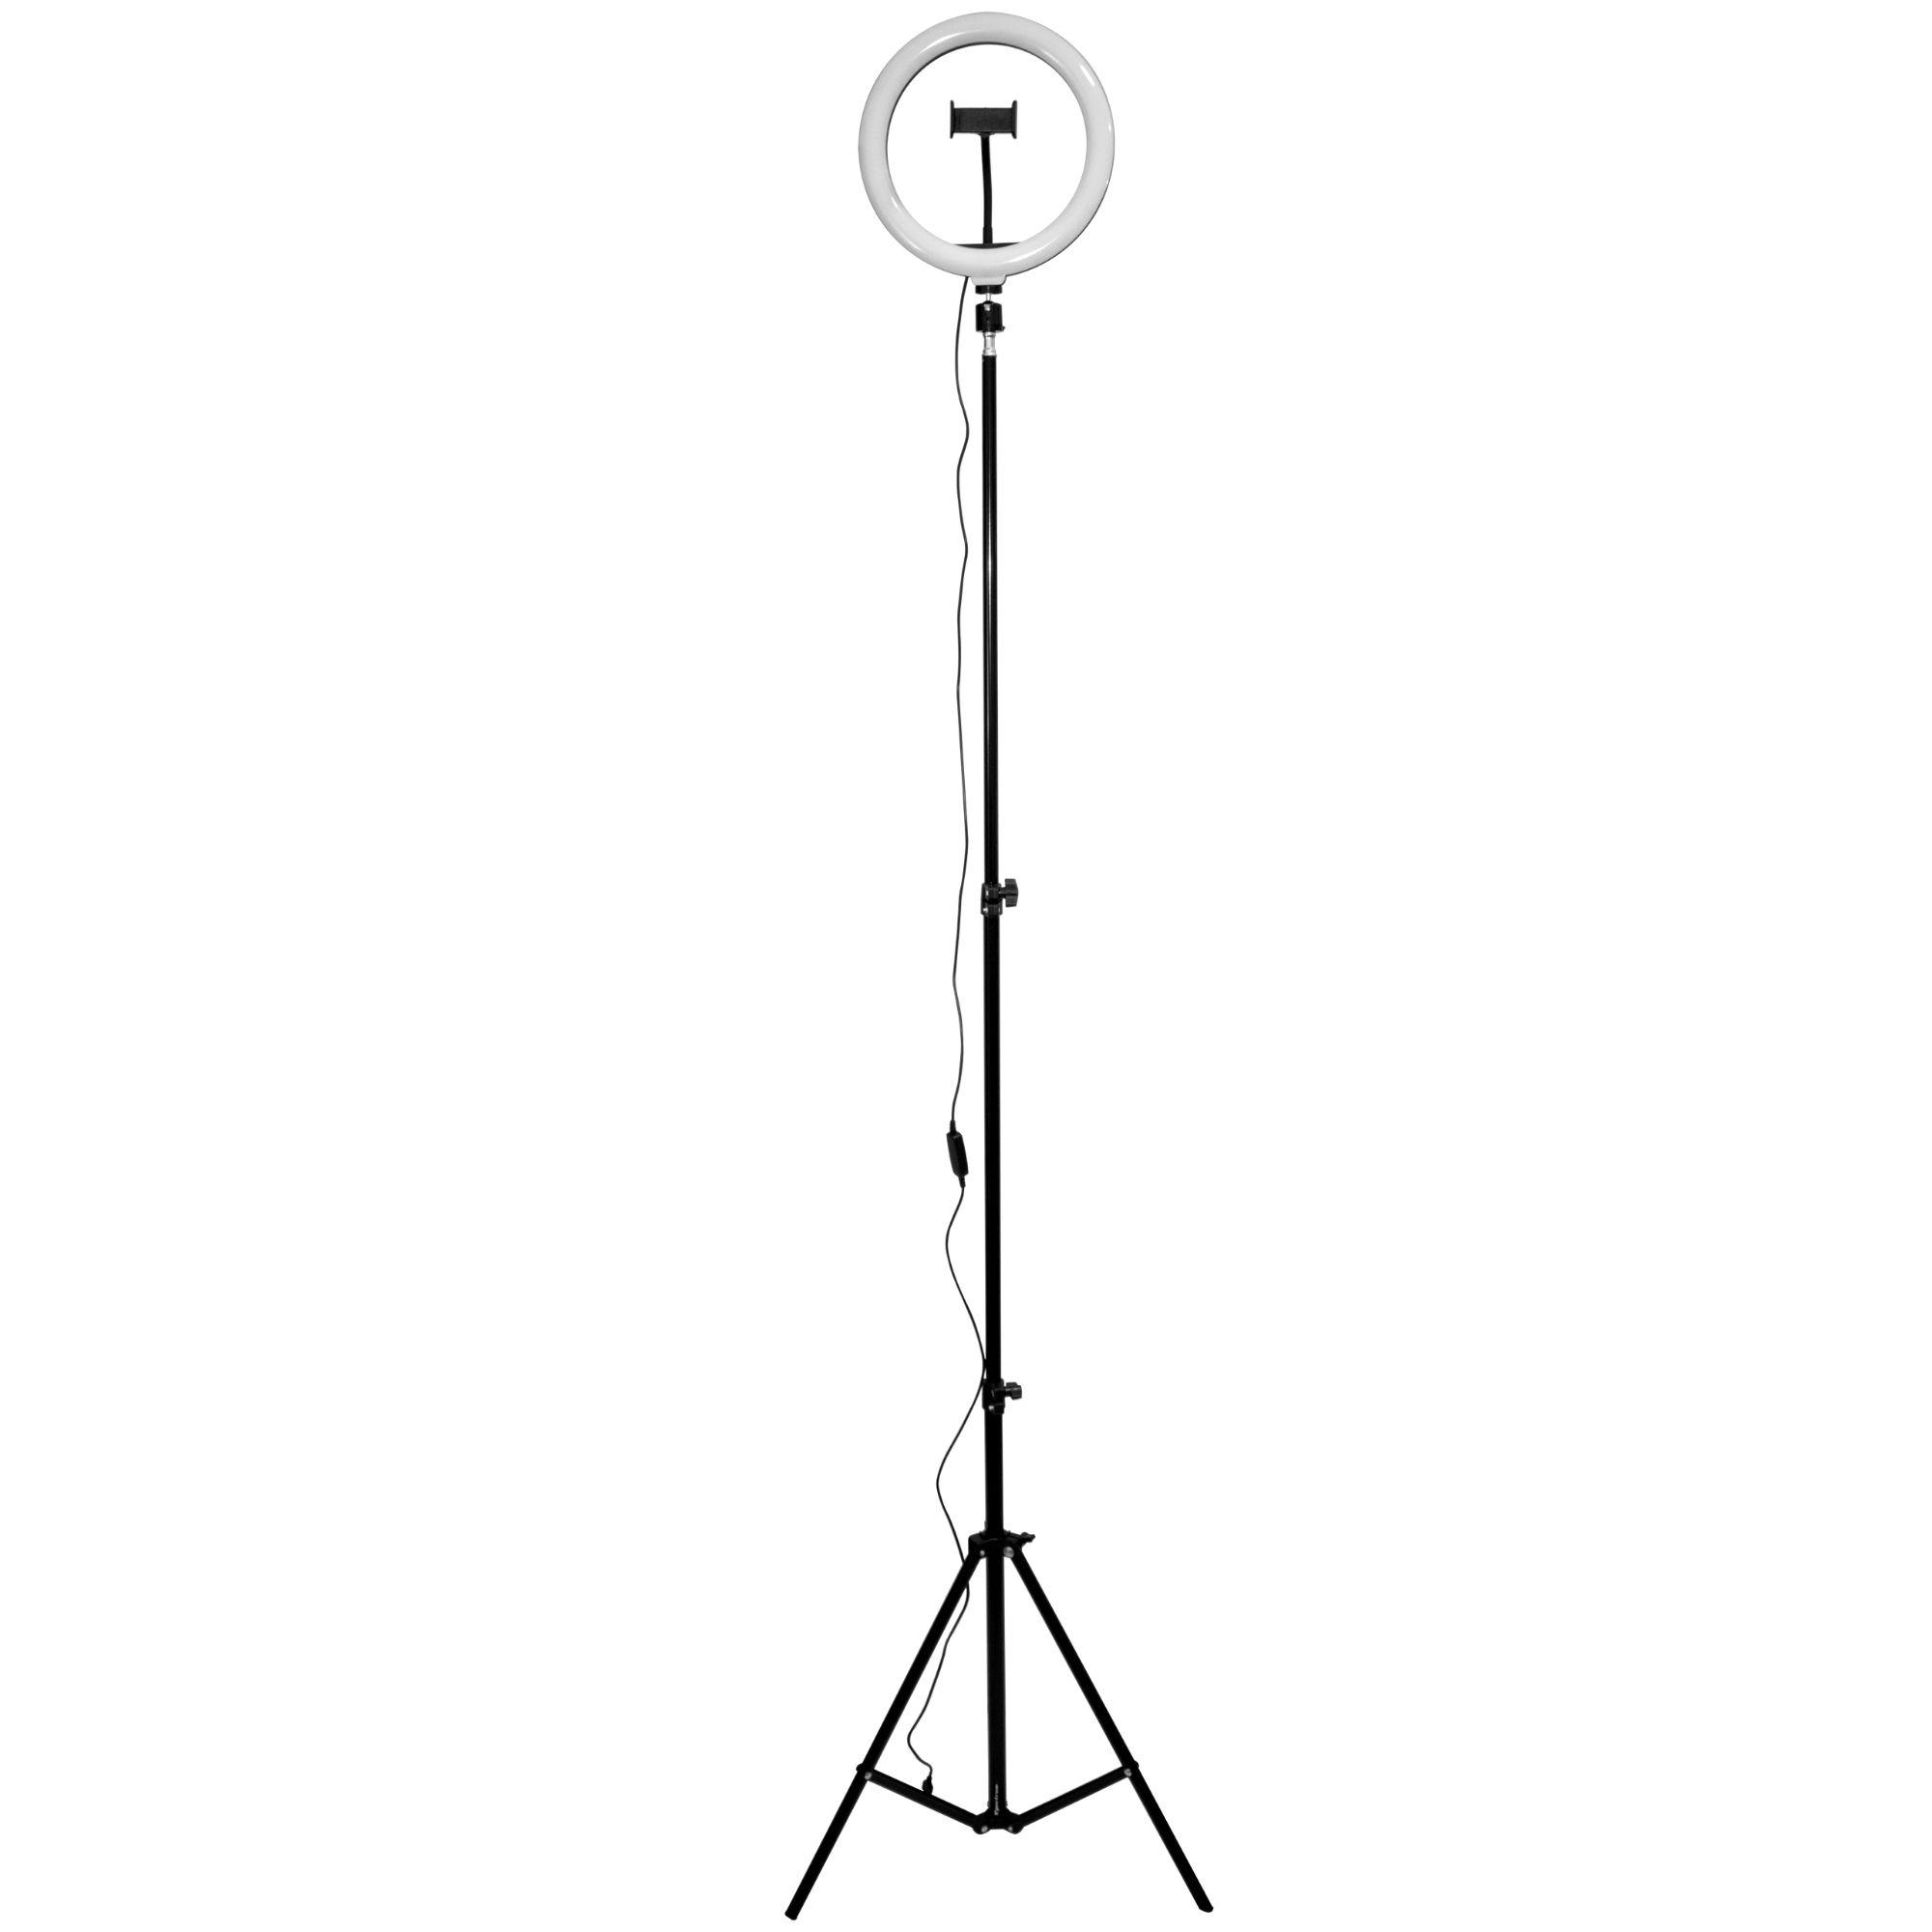 ILUMINADOR RING LIGHT SP-26 LED, 26 CM, 10 POLEGADAS, TRIPÉ 2.1 METROS, SPECTRUM